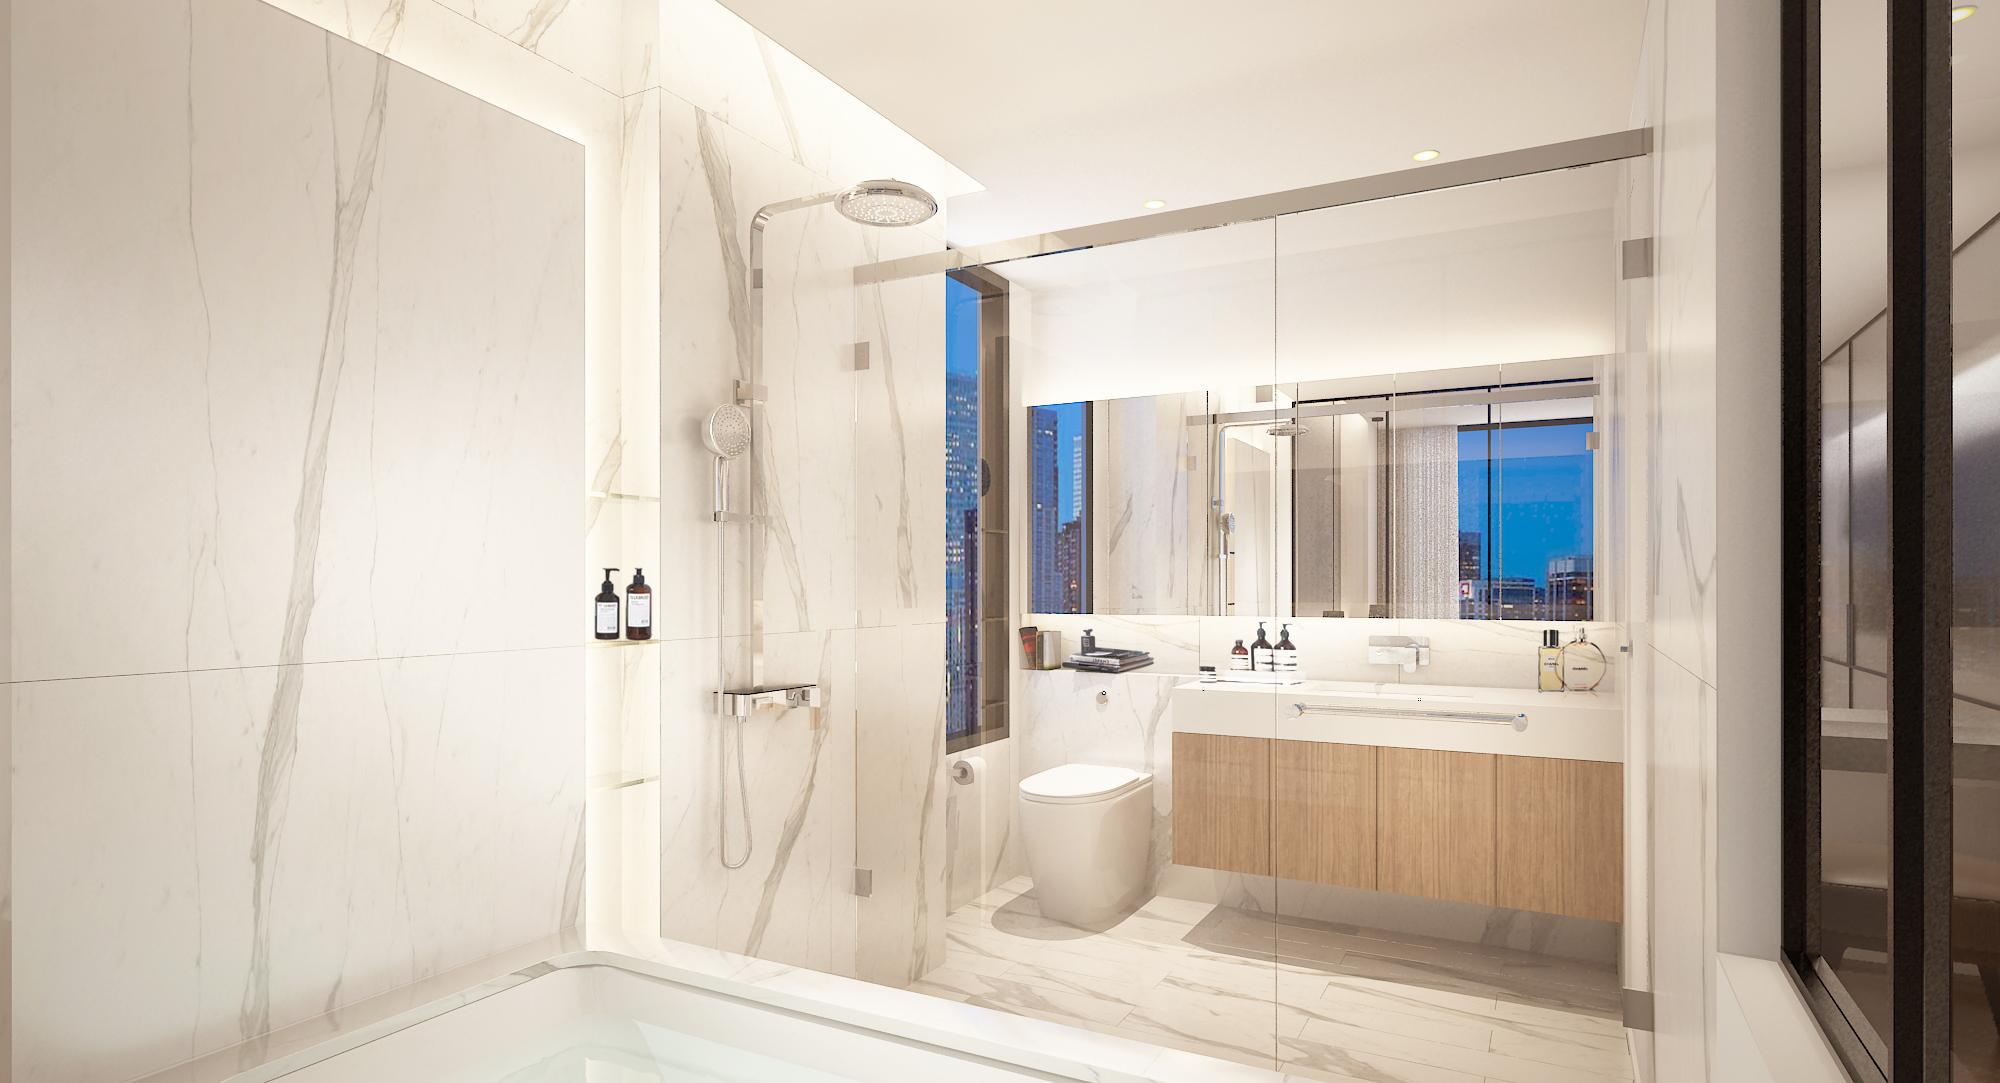 BOIFFILS-Muniq23-Pers-UNIT-88-04-Bathroom.jpg